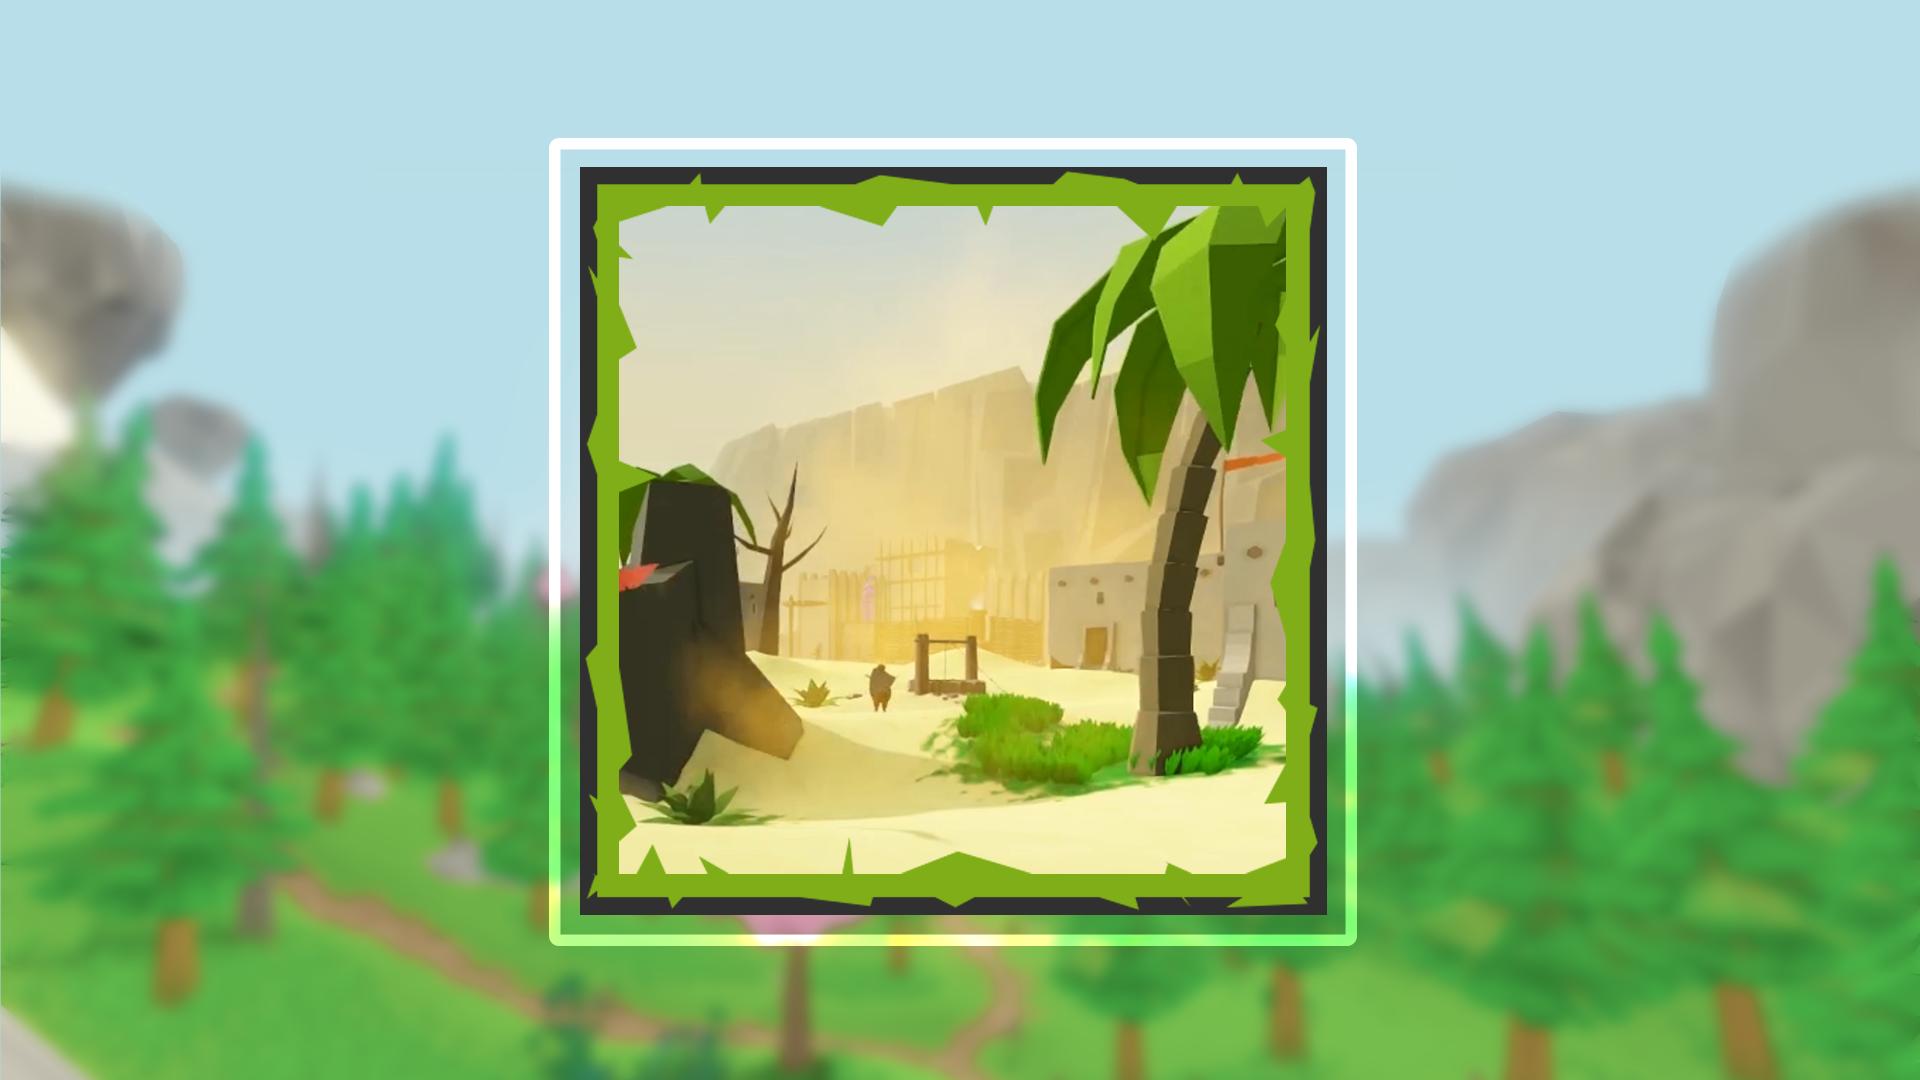 Maaki Desert achievement for Windscape on Xbox One